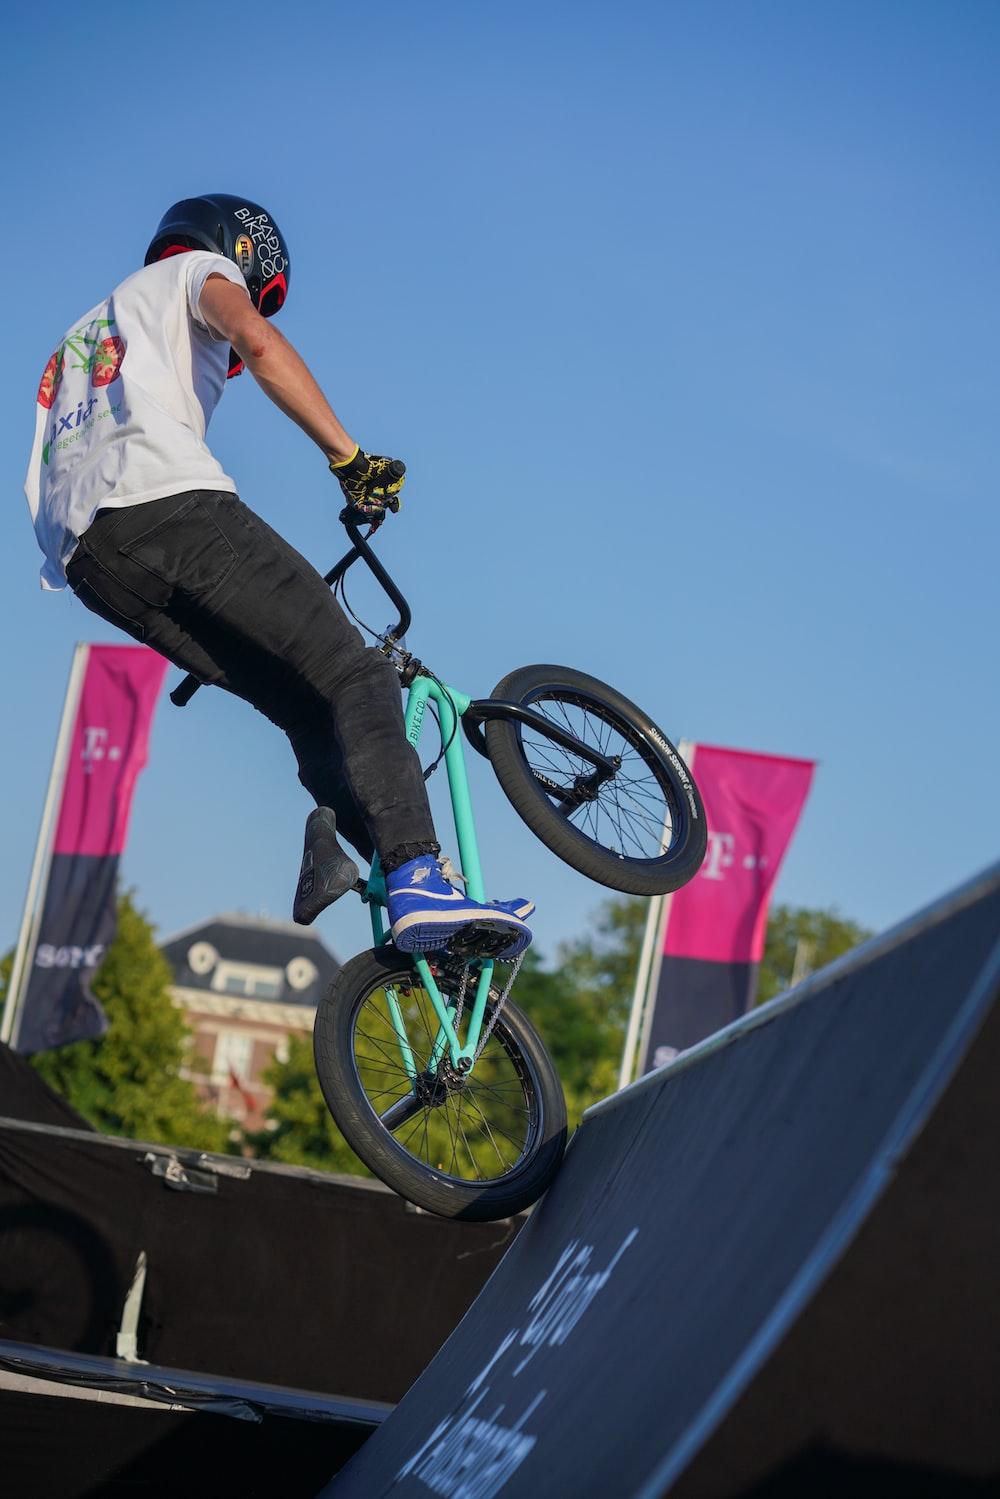 man riding BMX bike